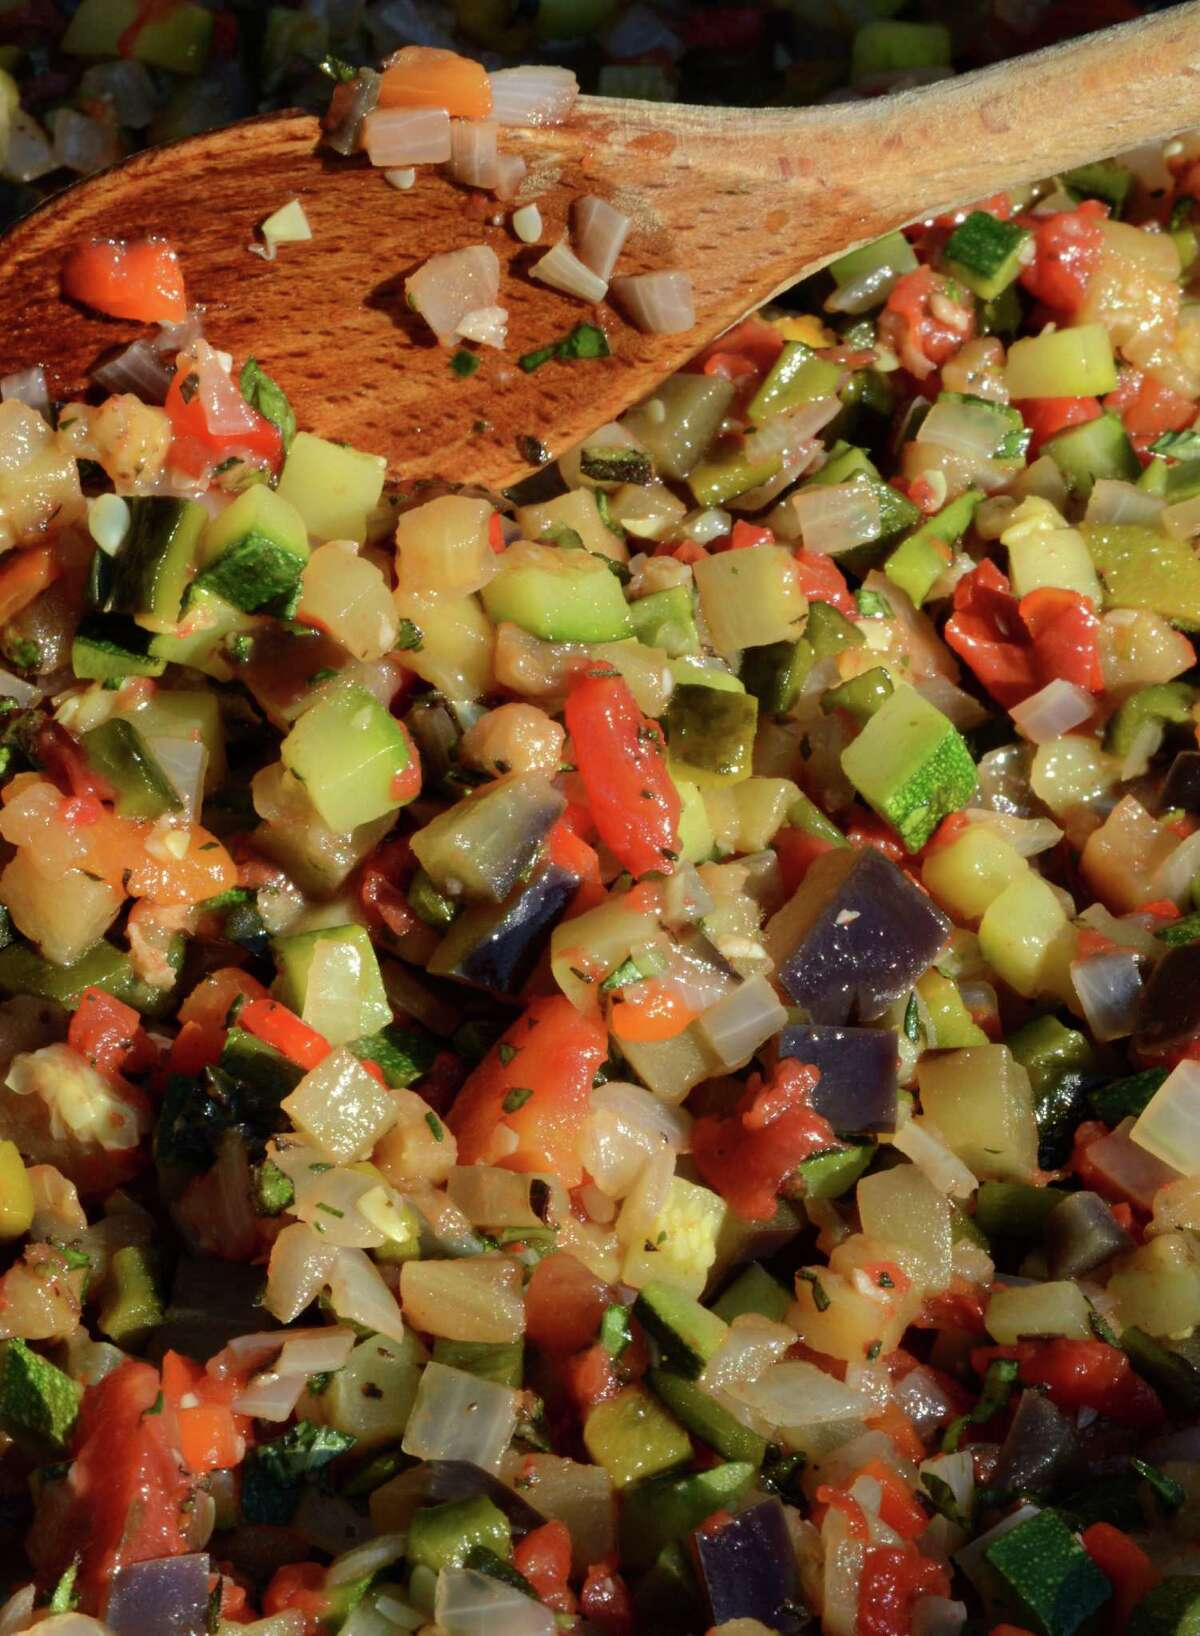 Green chili ratatouille from